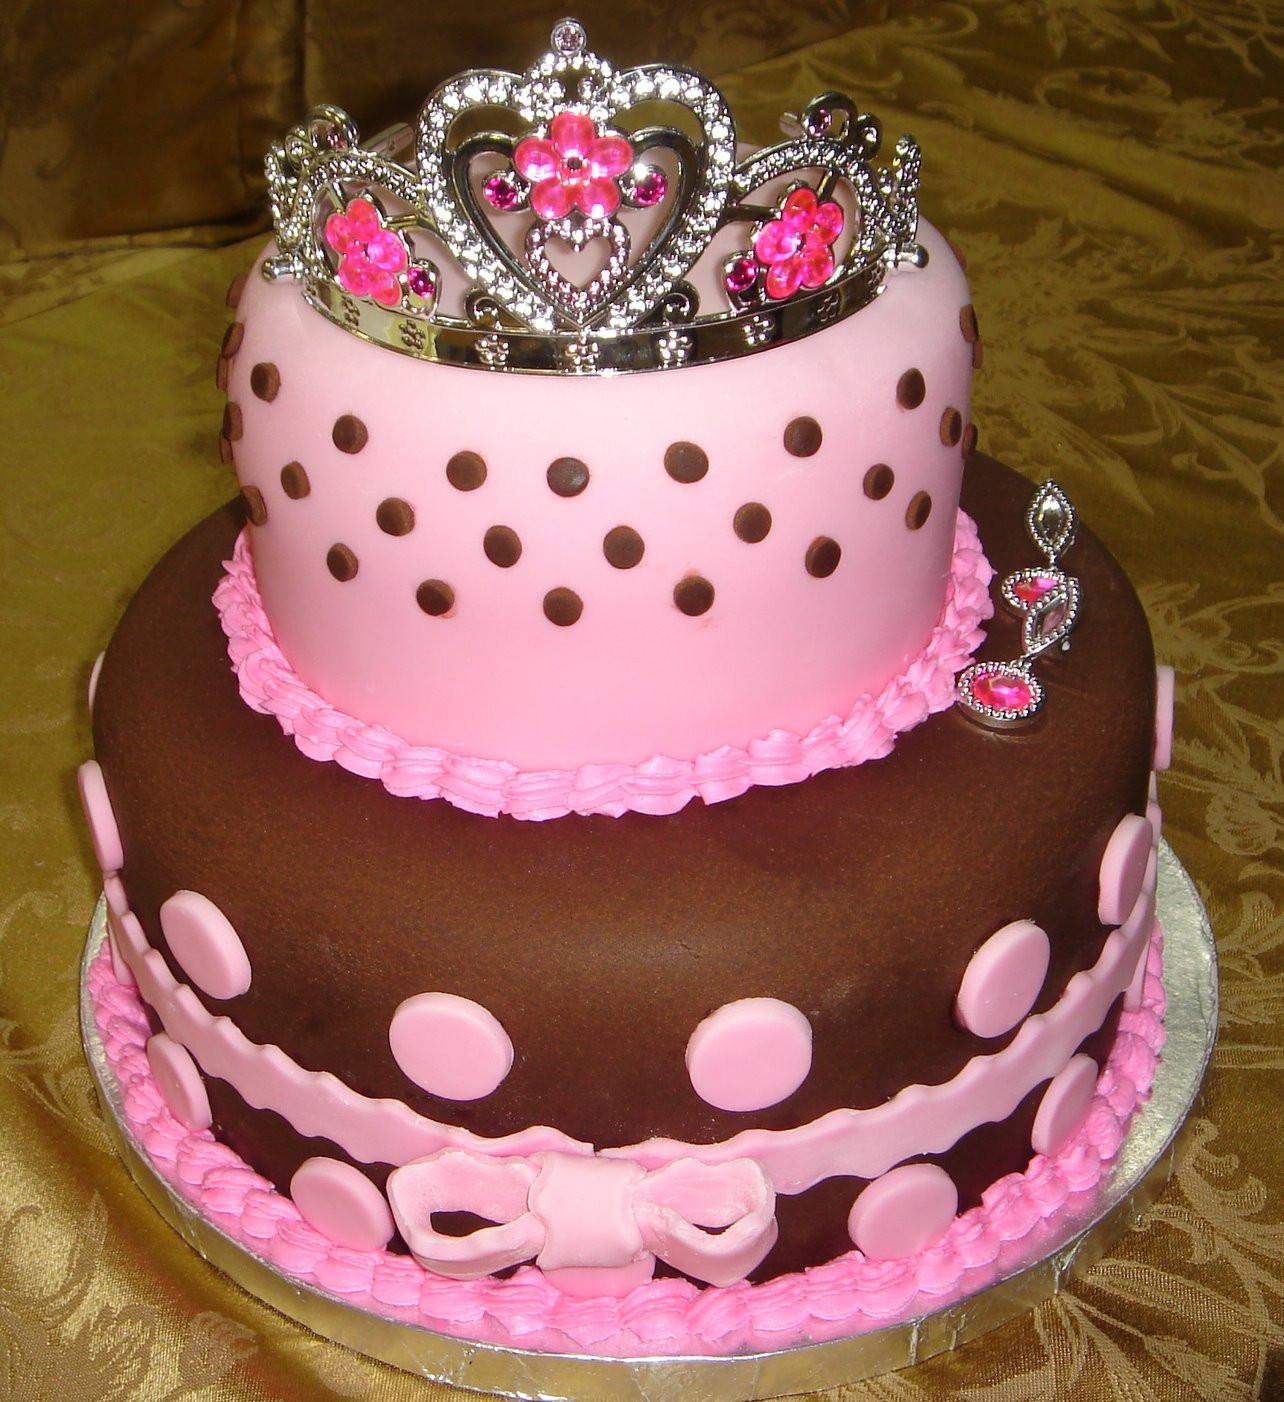 Best ideas about Princes Birthday Cake . Save or Pin cake birthday kids fondant buttercream princess castle Now.